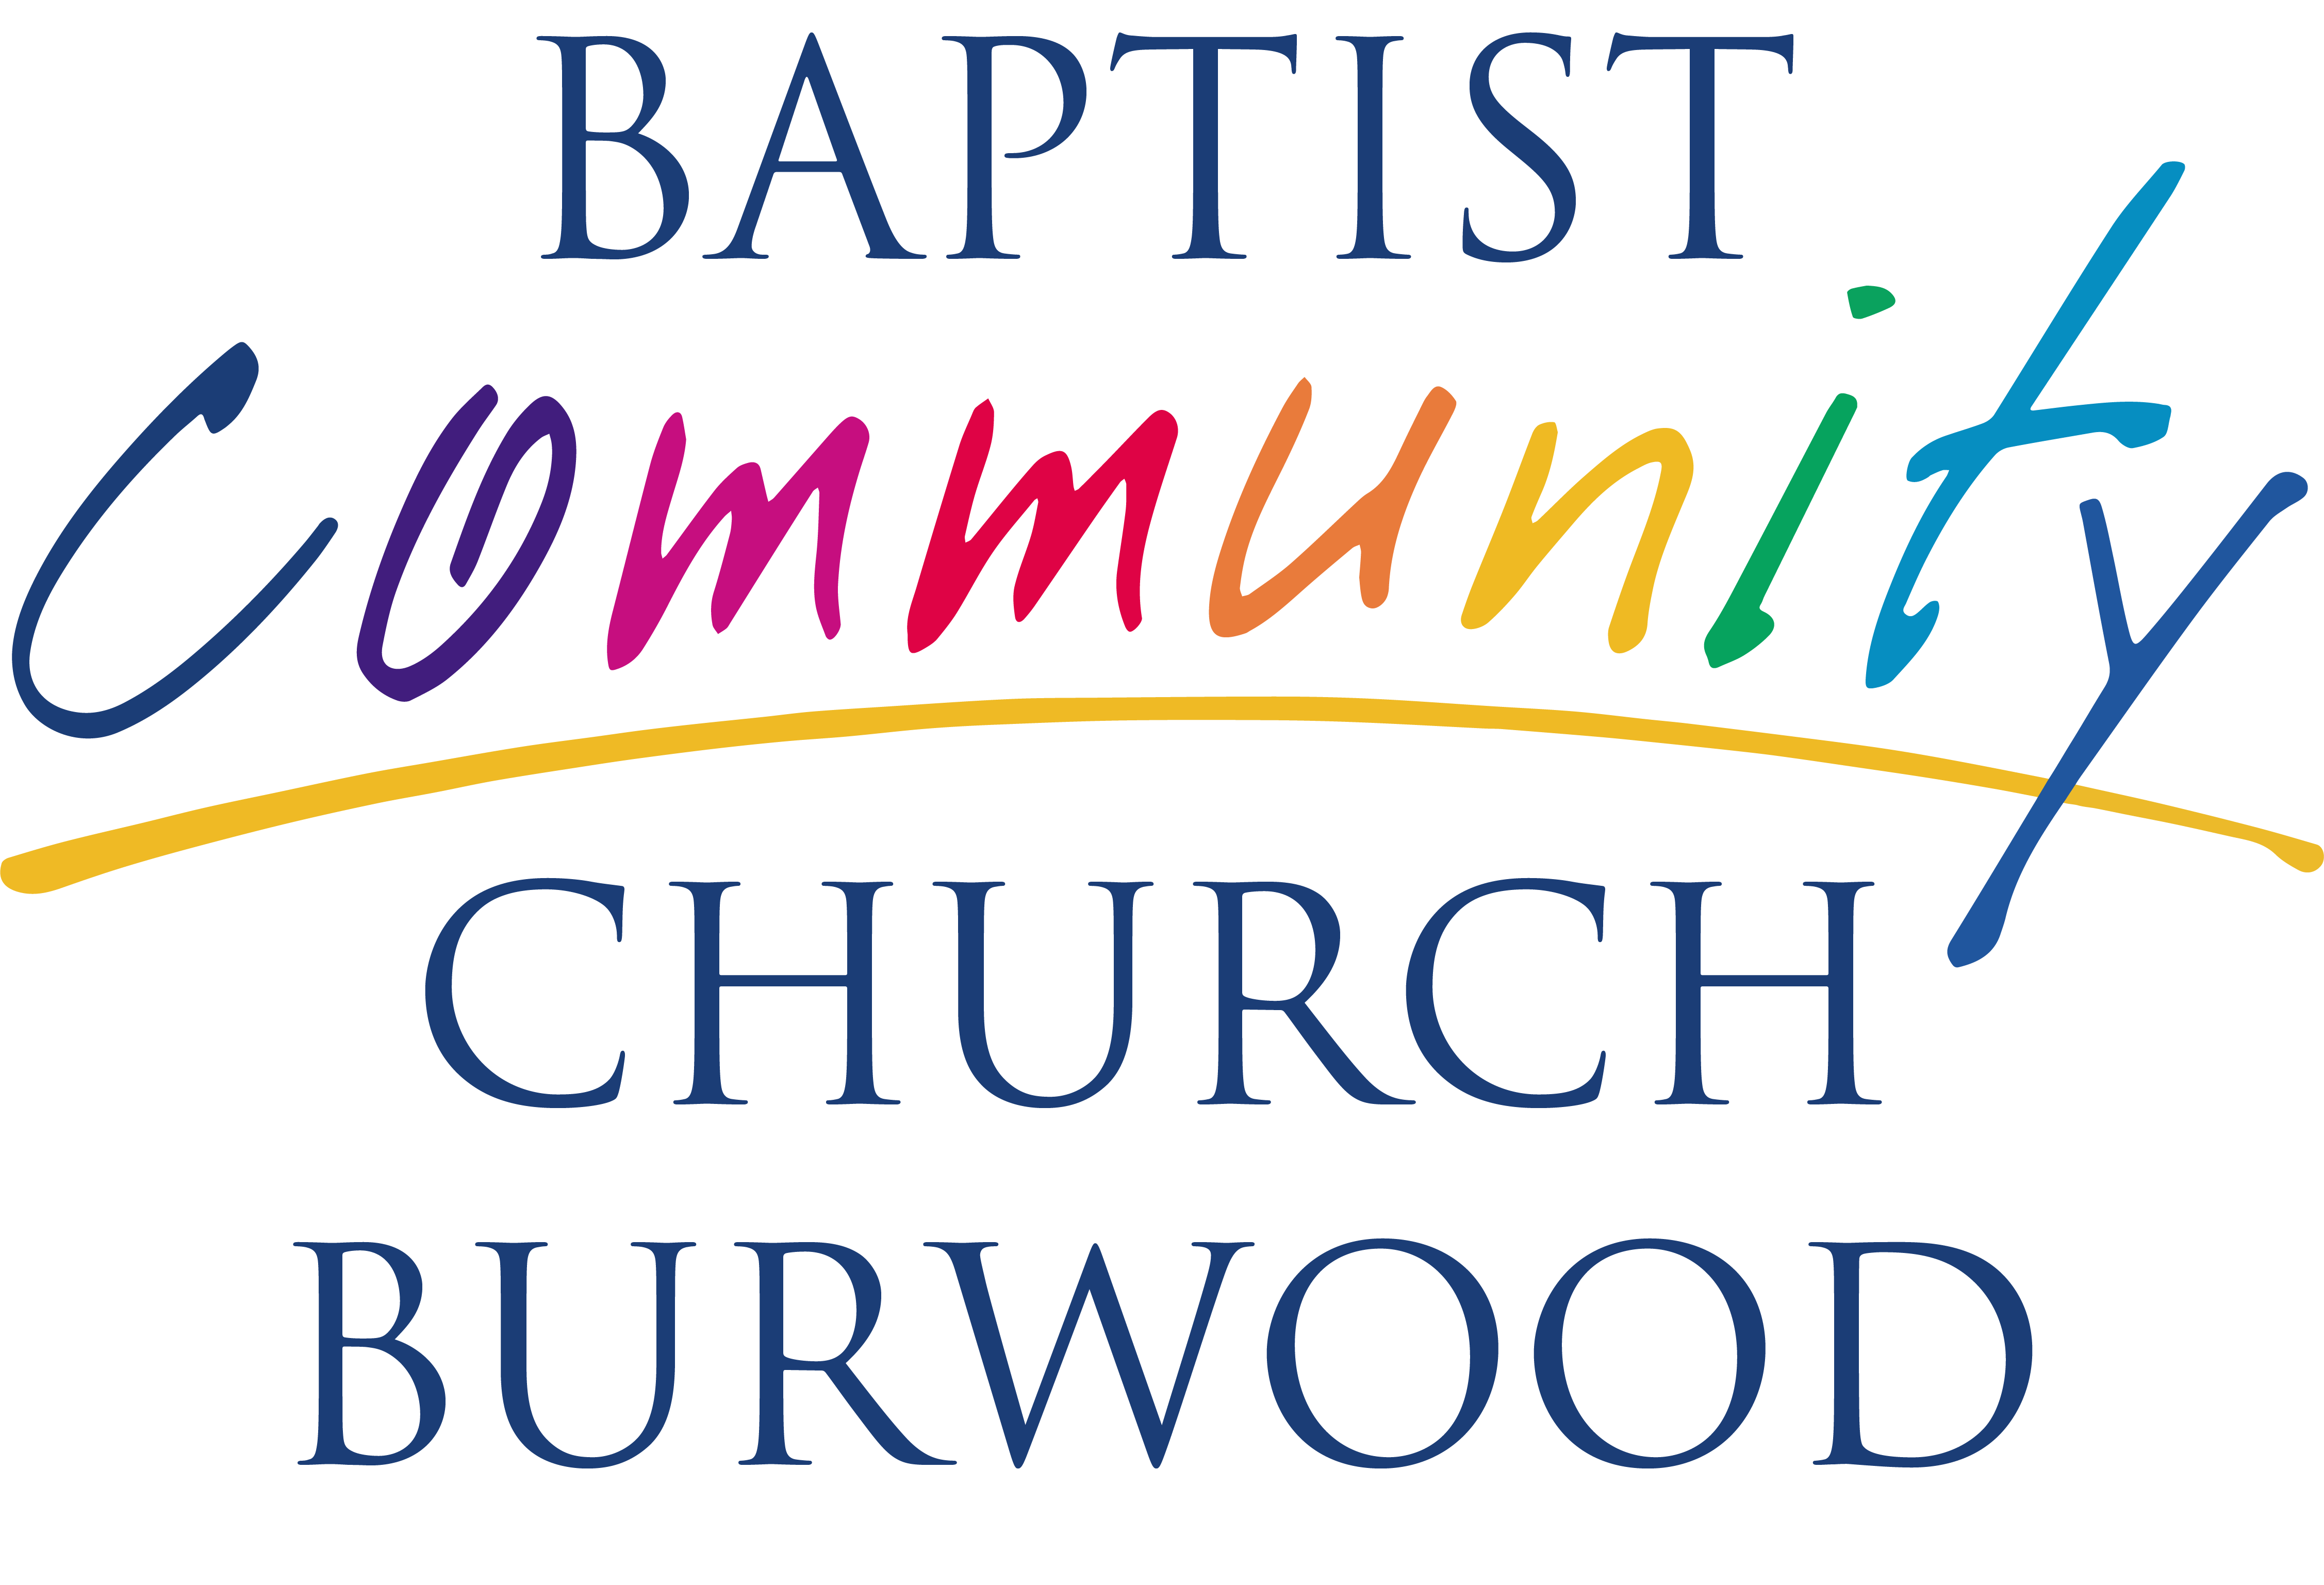 Baptist Community Church Burwood